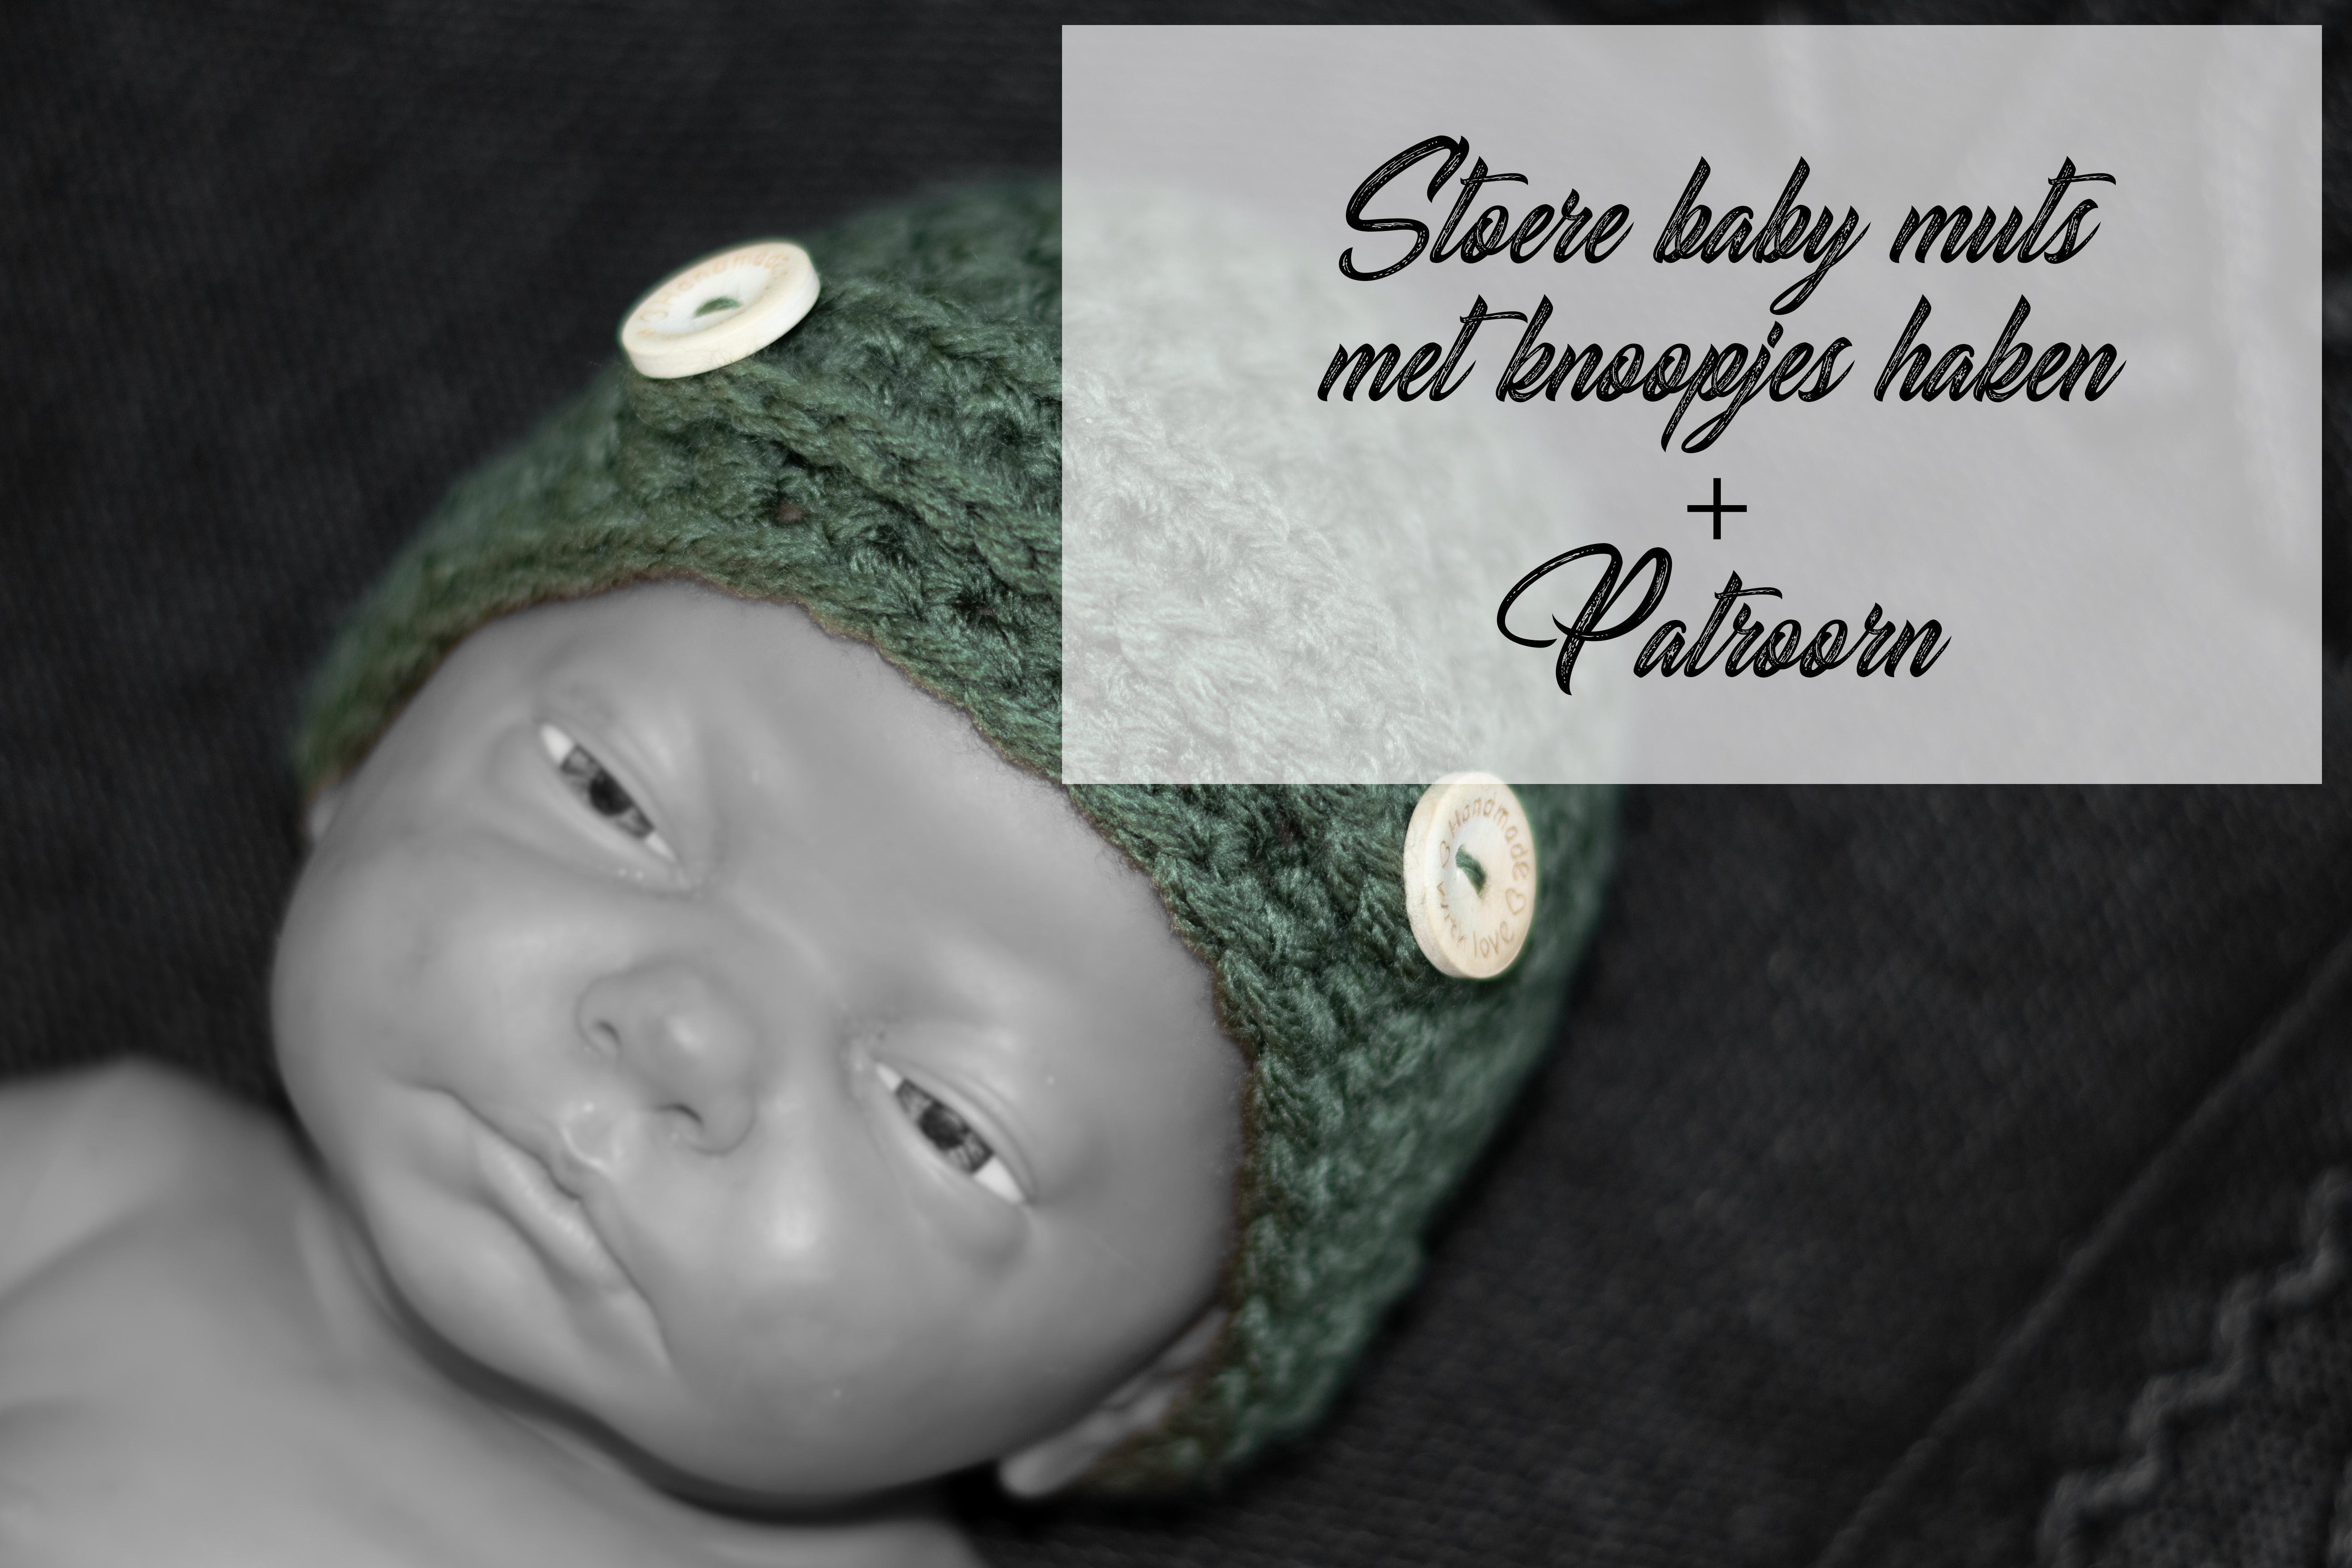 Stoere Baby Muts Haken Met Knoopjes Liefkleinwonder